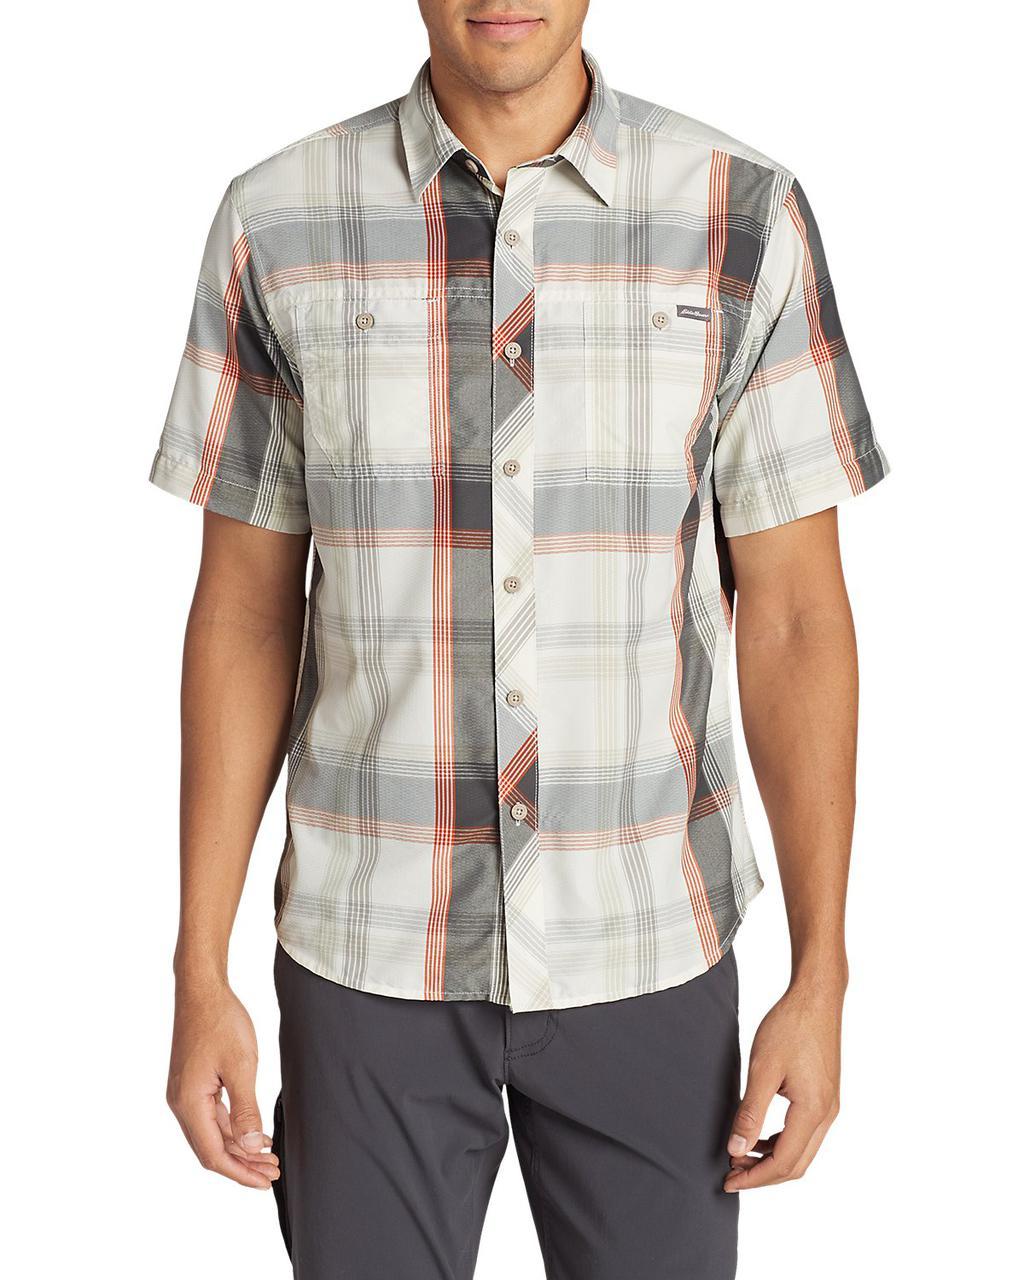 Тенниска Eddie Bauer Greenpoint Short-Sleeve Shirt M